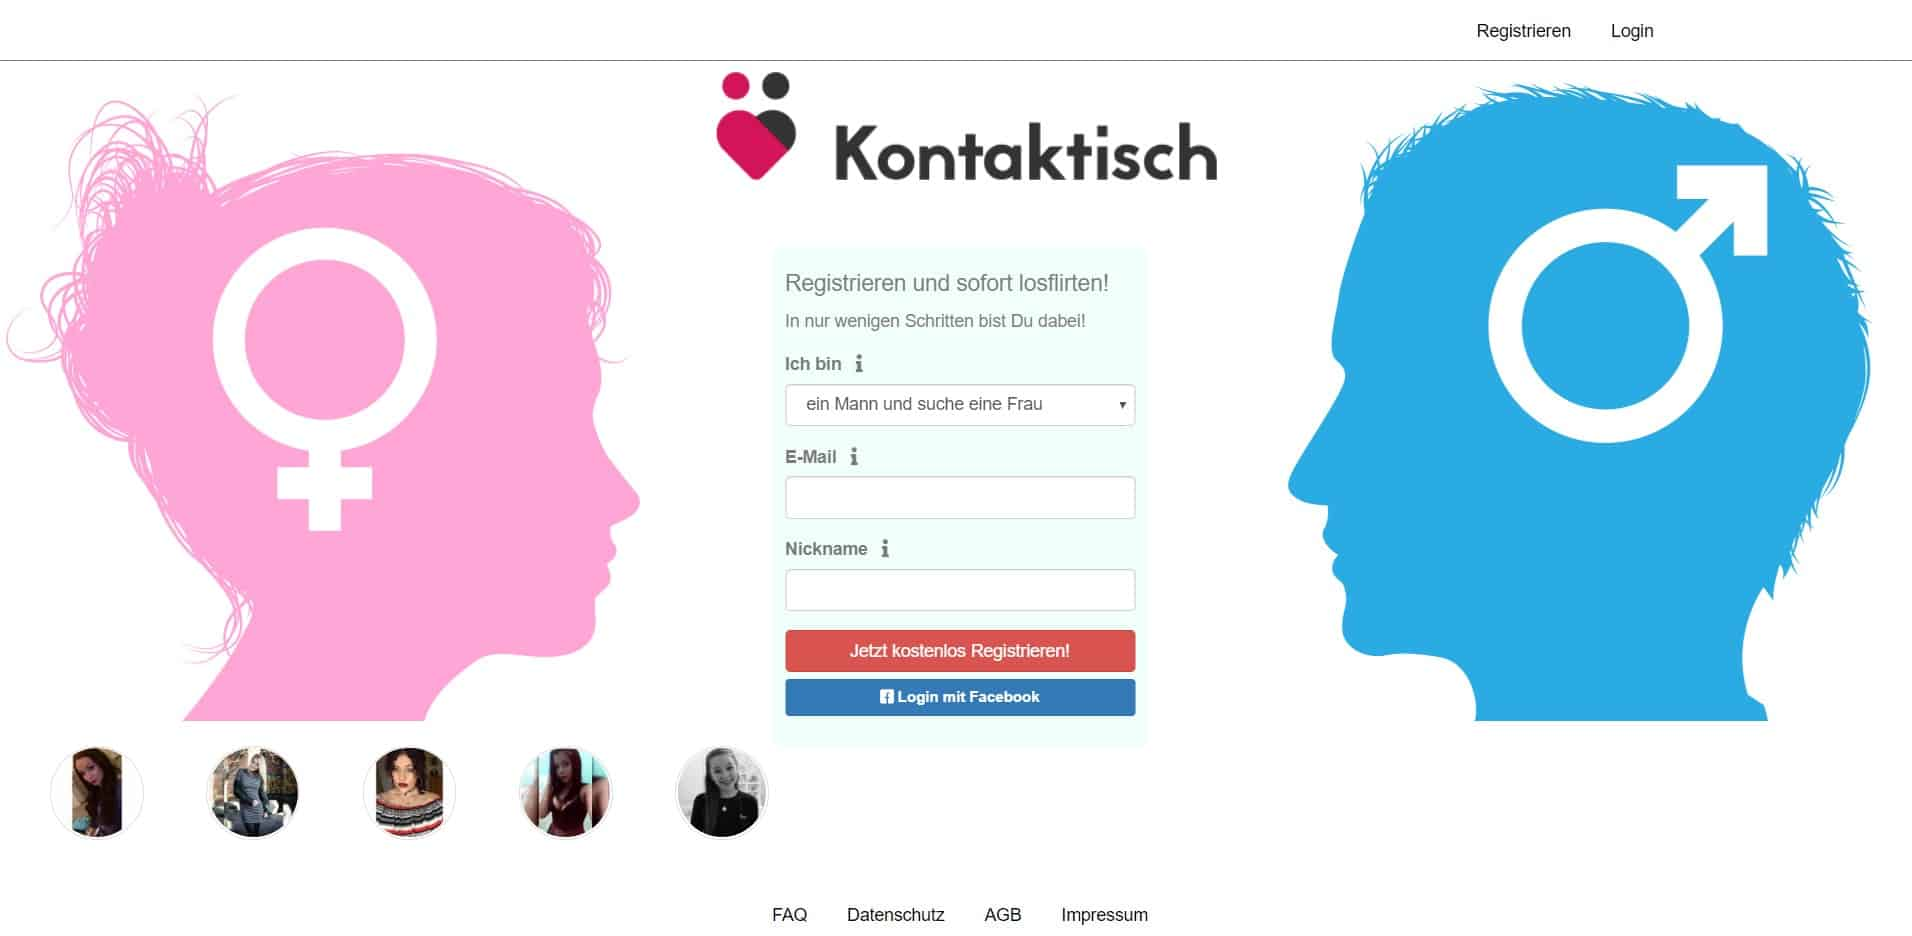 Testbericht: Kontaktisch.de Abzocke